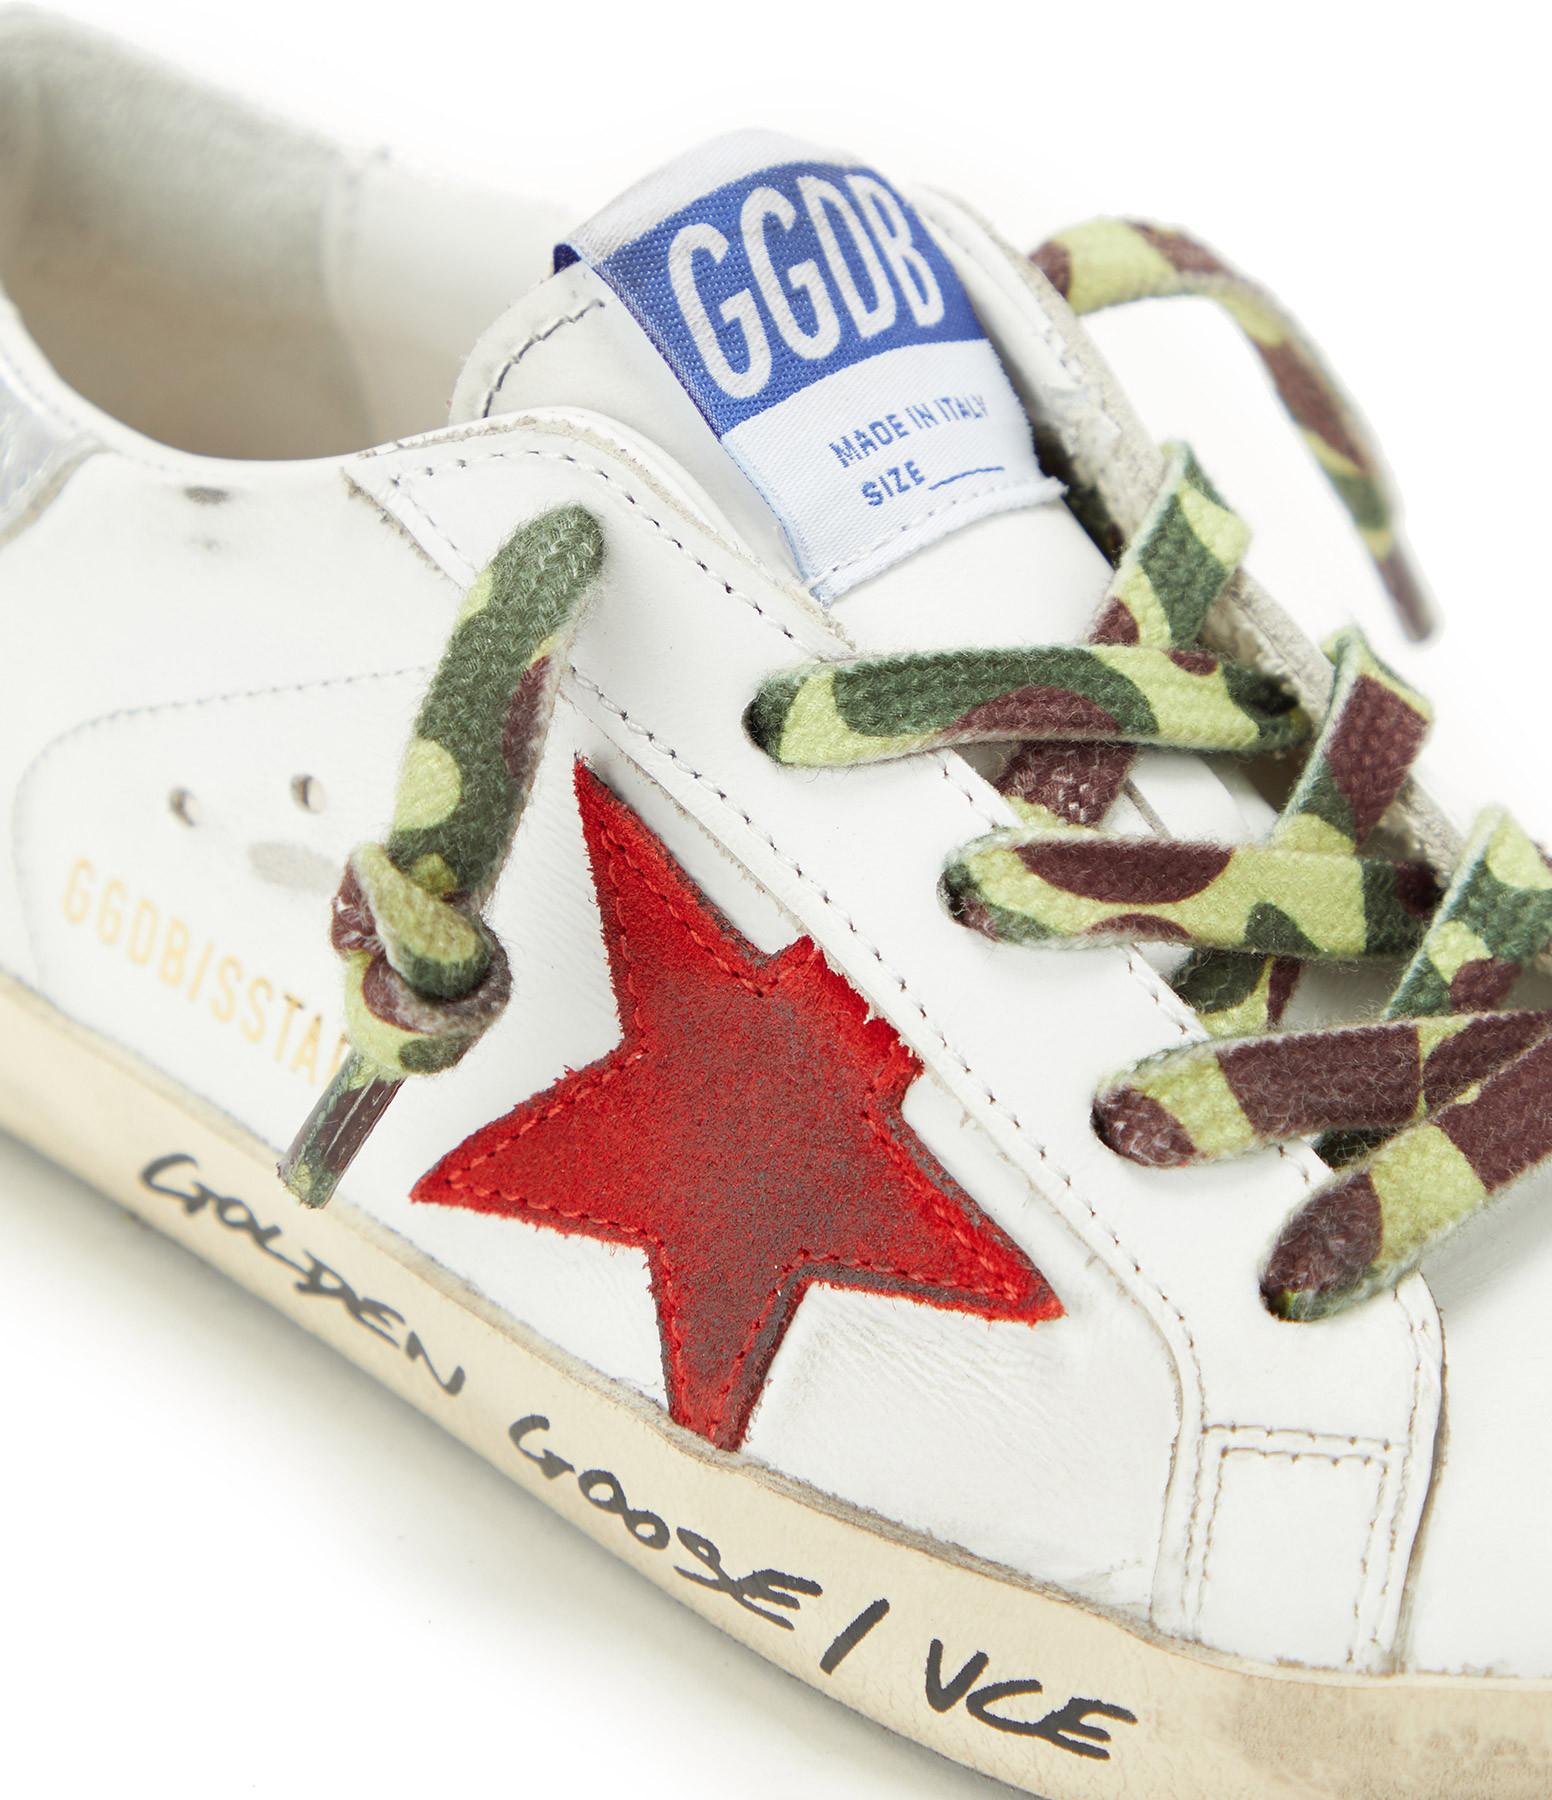 GOLDEN GOOSE - Baskets Enfant Superstar Cuir Signature Rubis Argenté